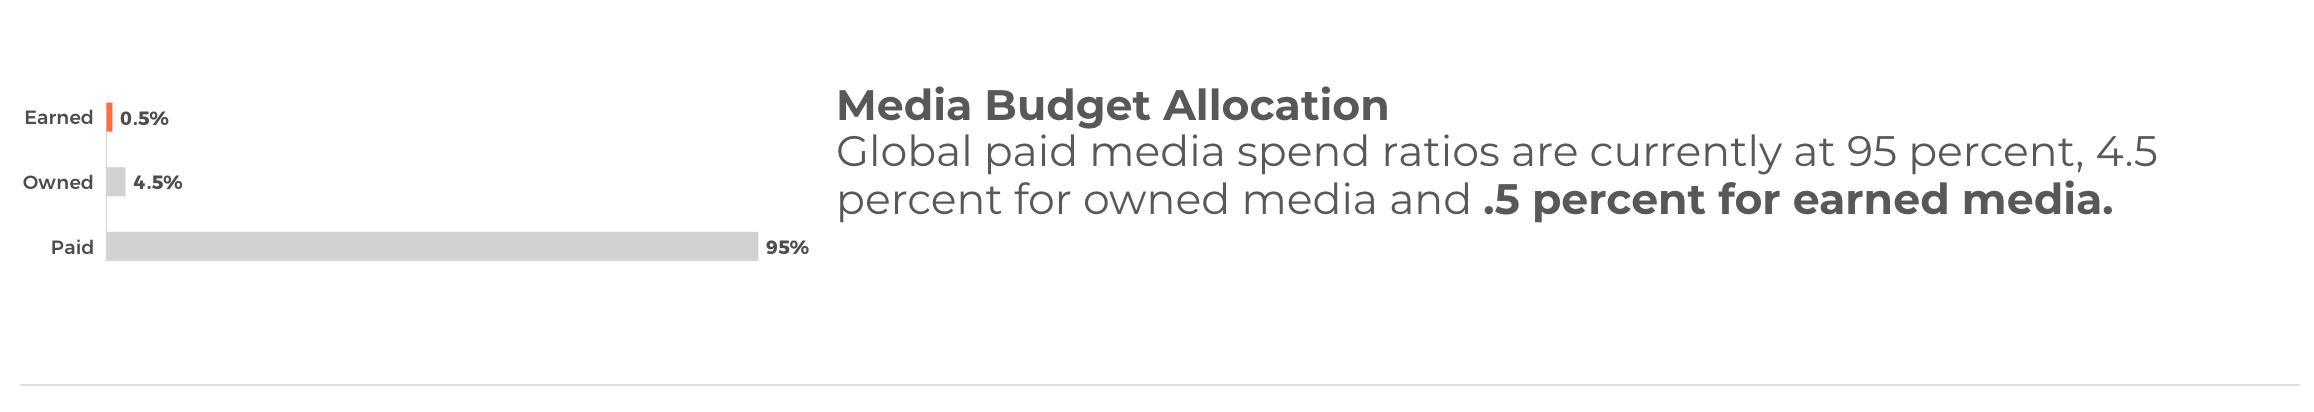 Media Budget Allocation